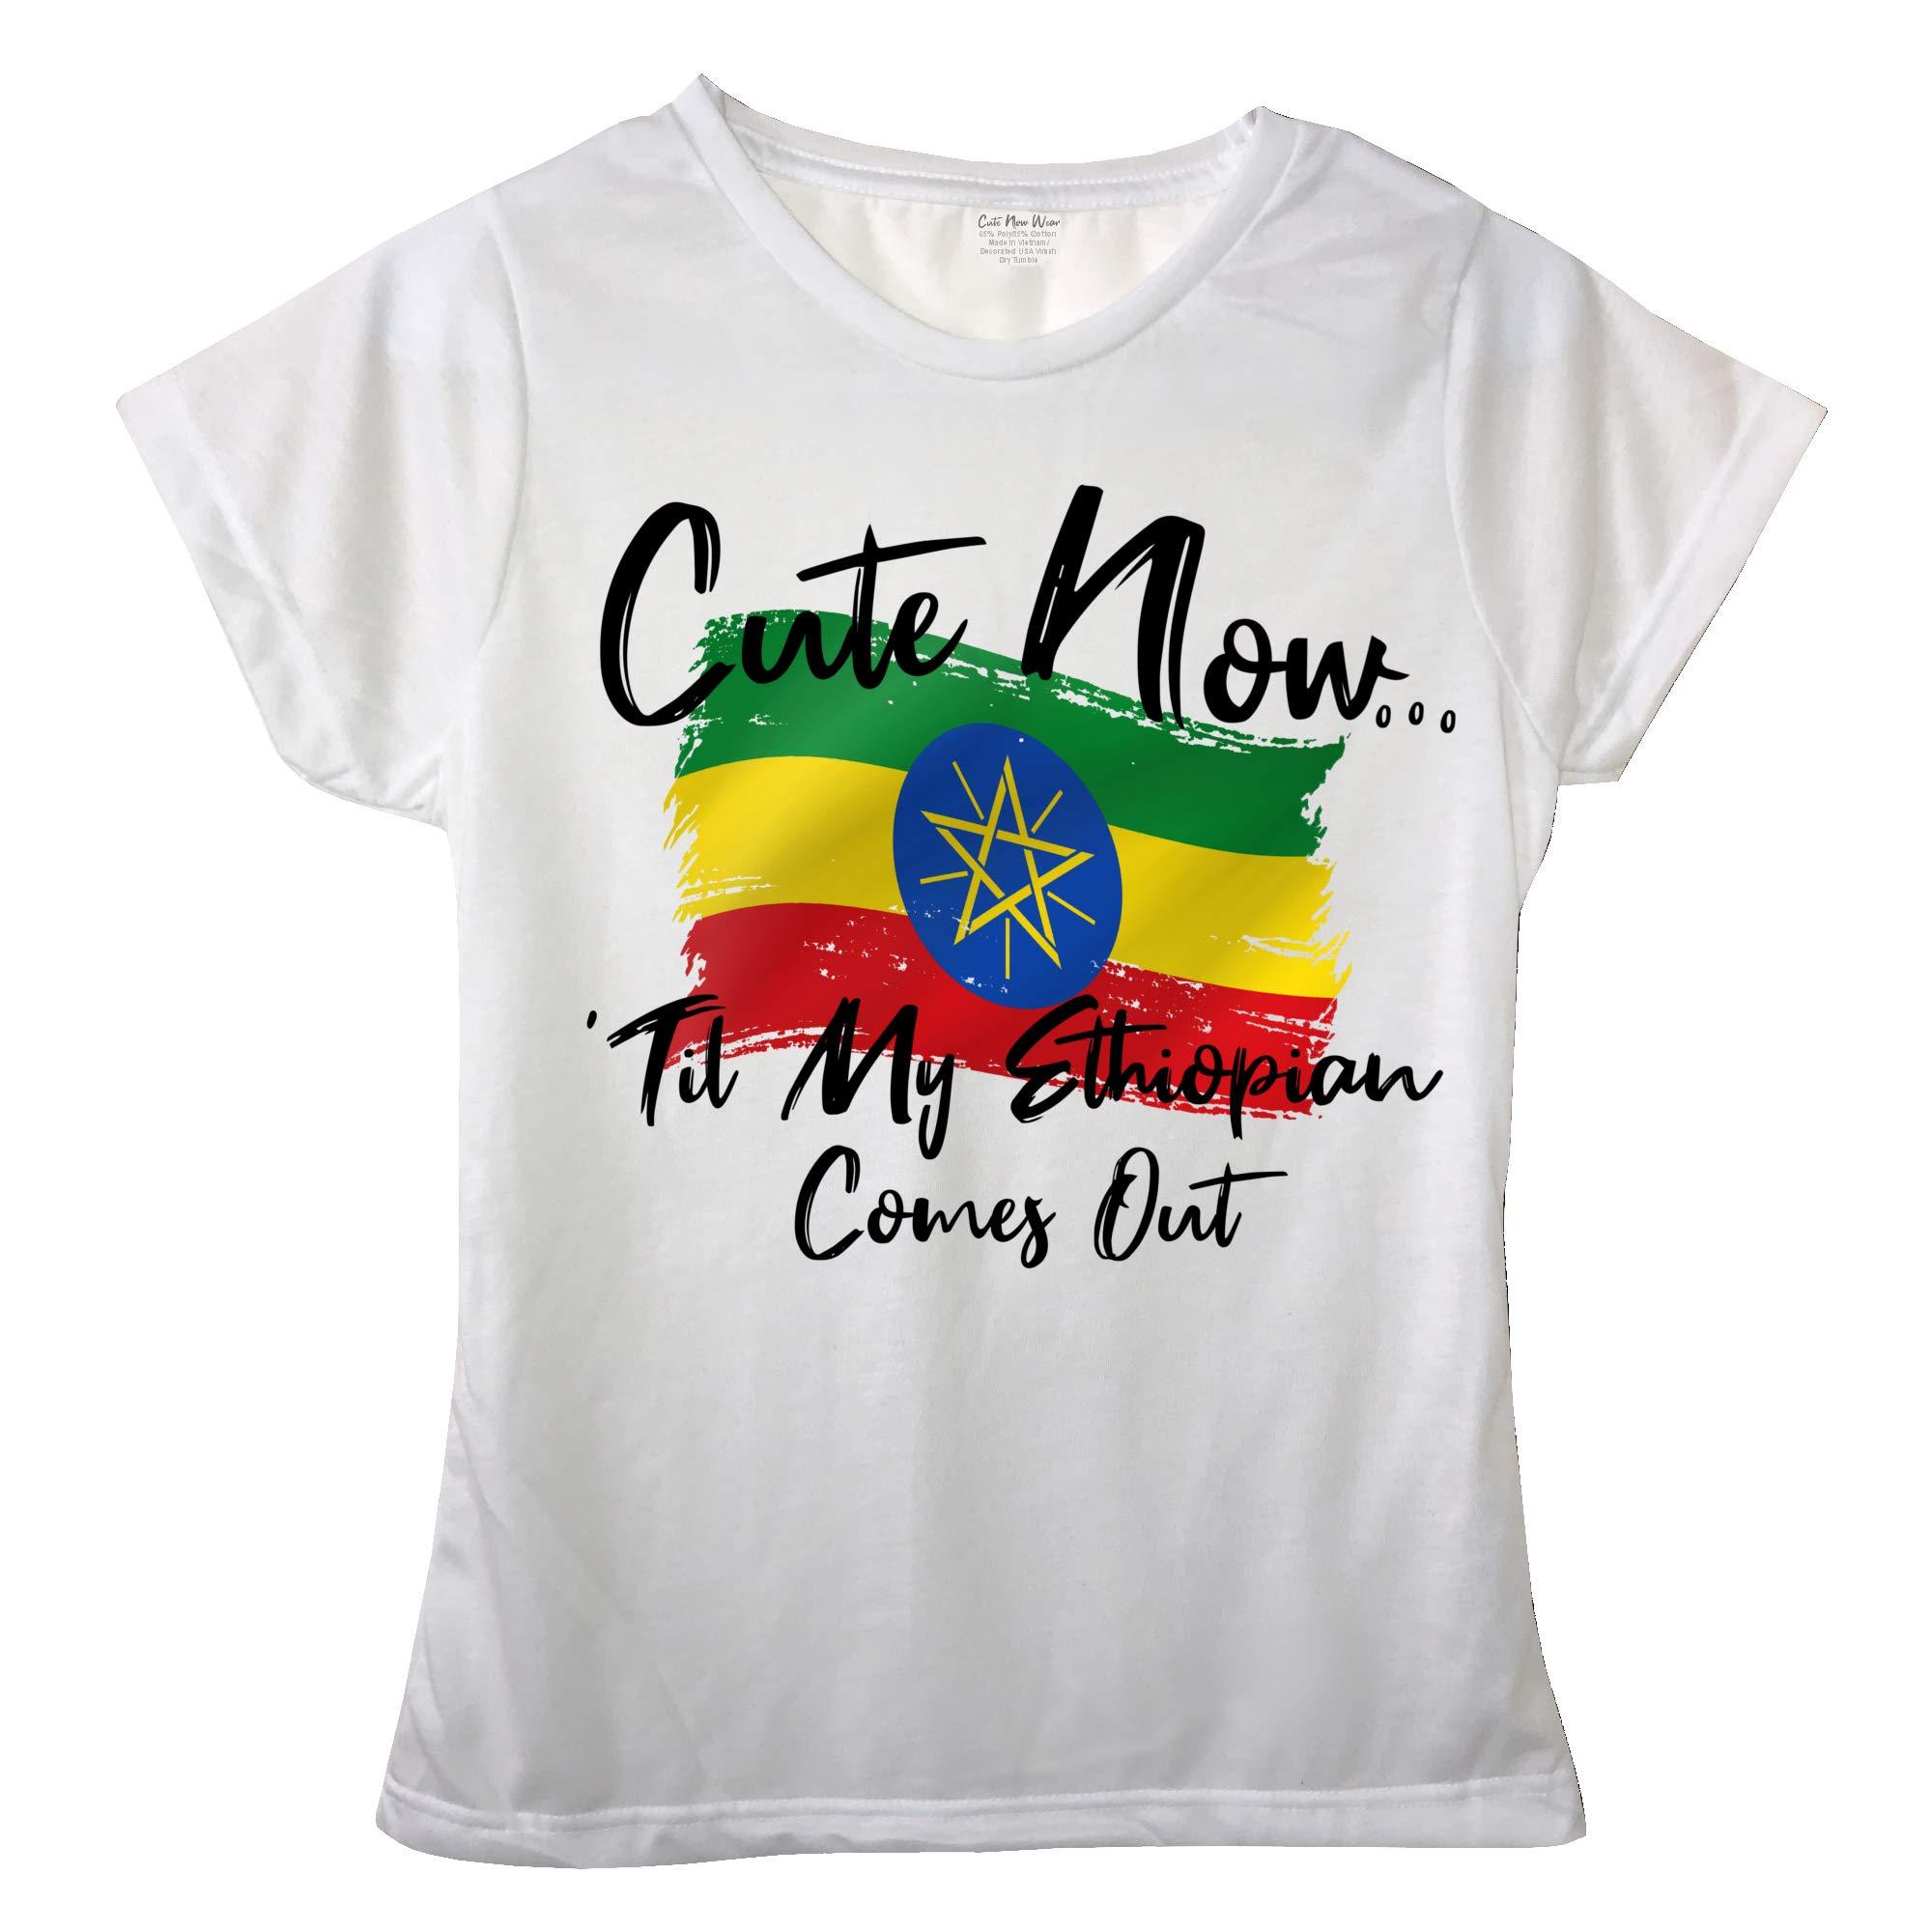 Cute Now Ladies Ethiopia T-Shirt Til My Ethiopian Comes Out Womens White Short Sleeve Shirt Flag S-XXL